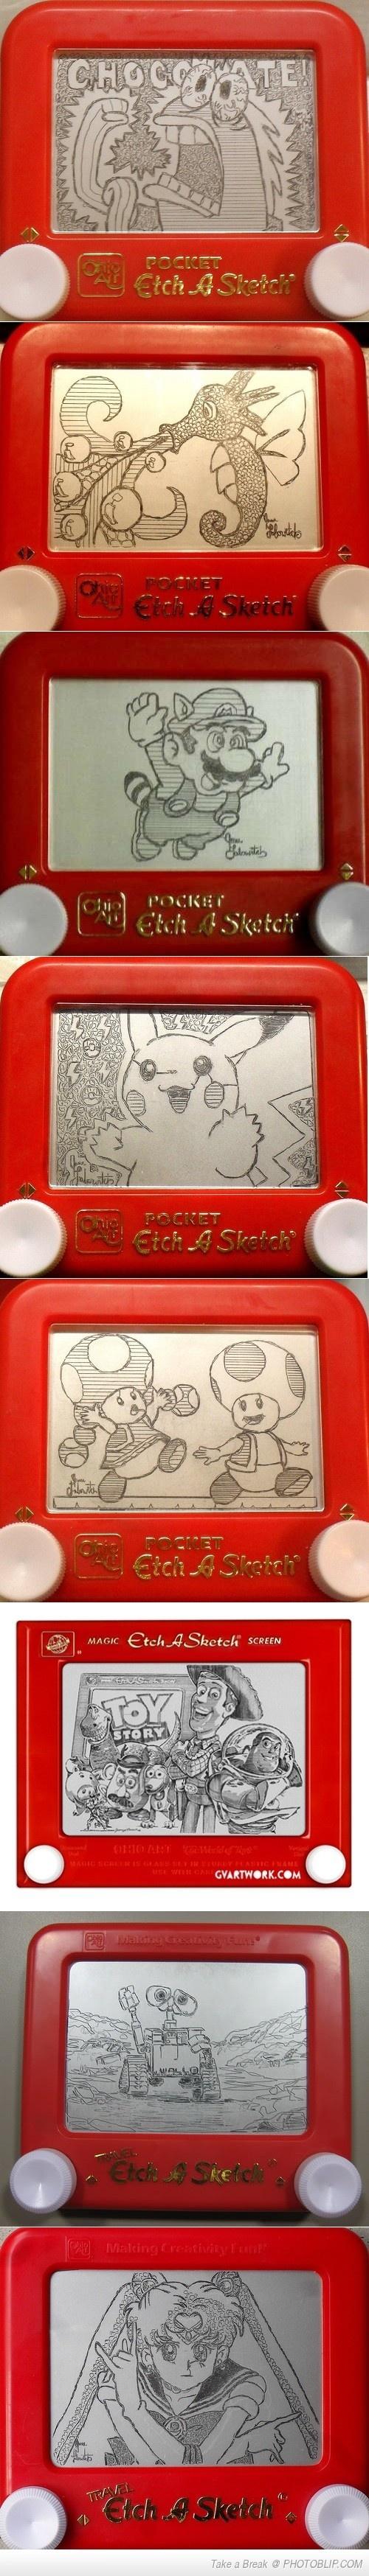 Etch-that-sketch Level - Master